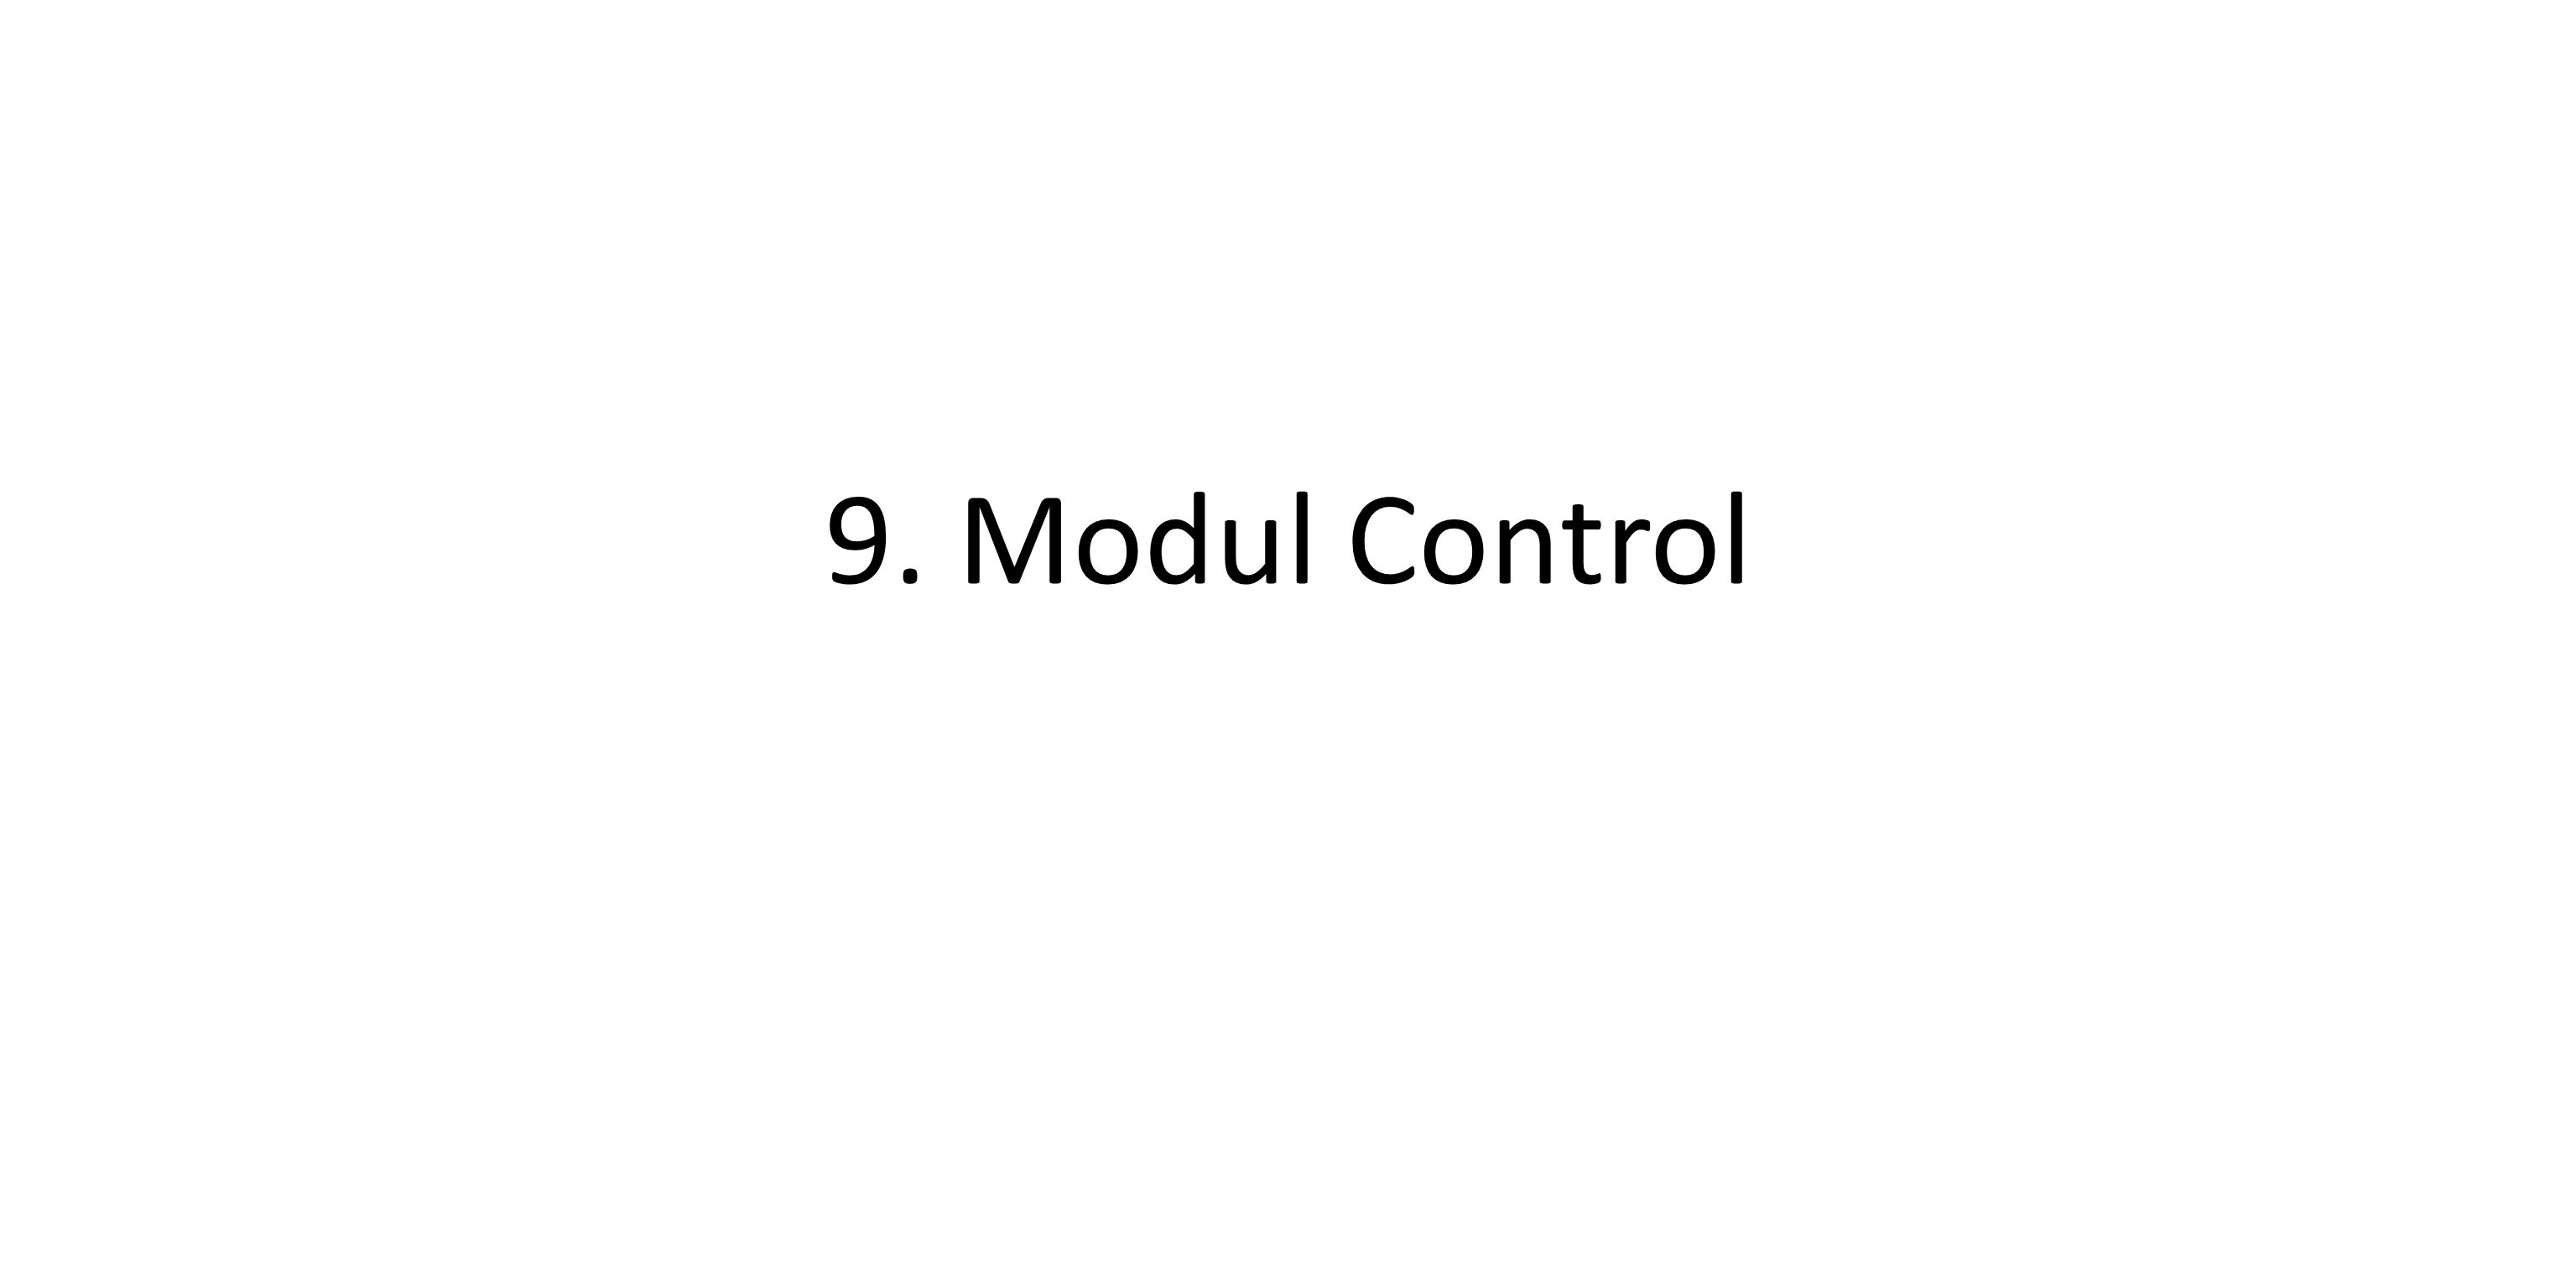 9. Modul Control